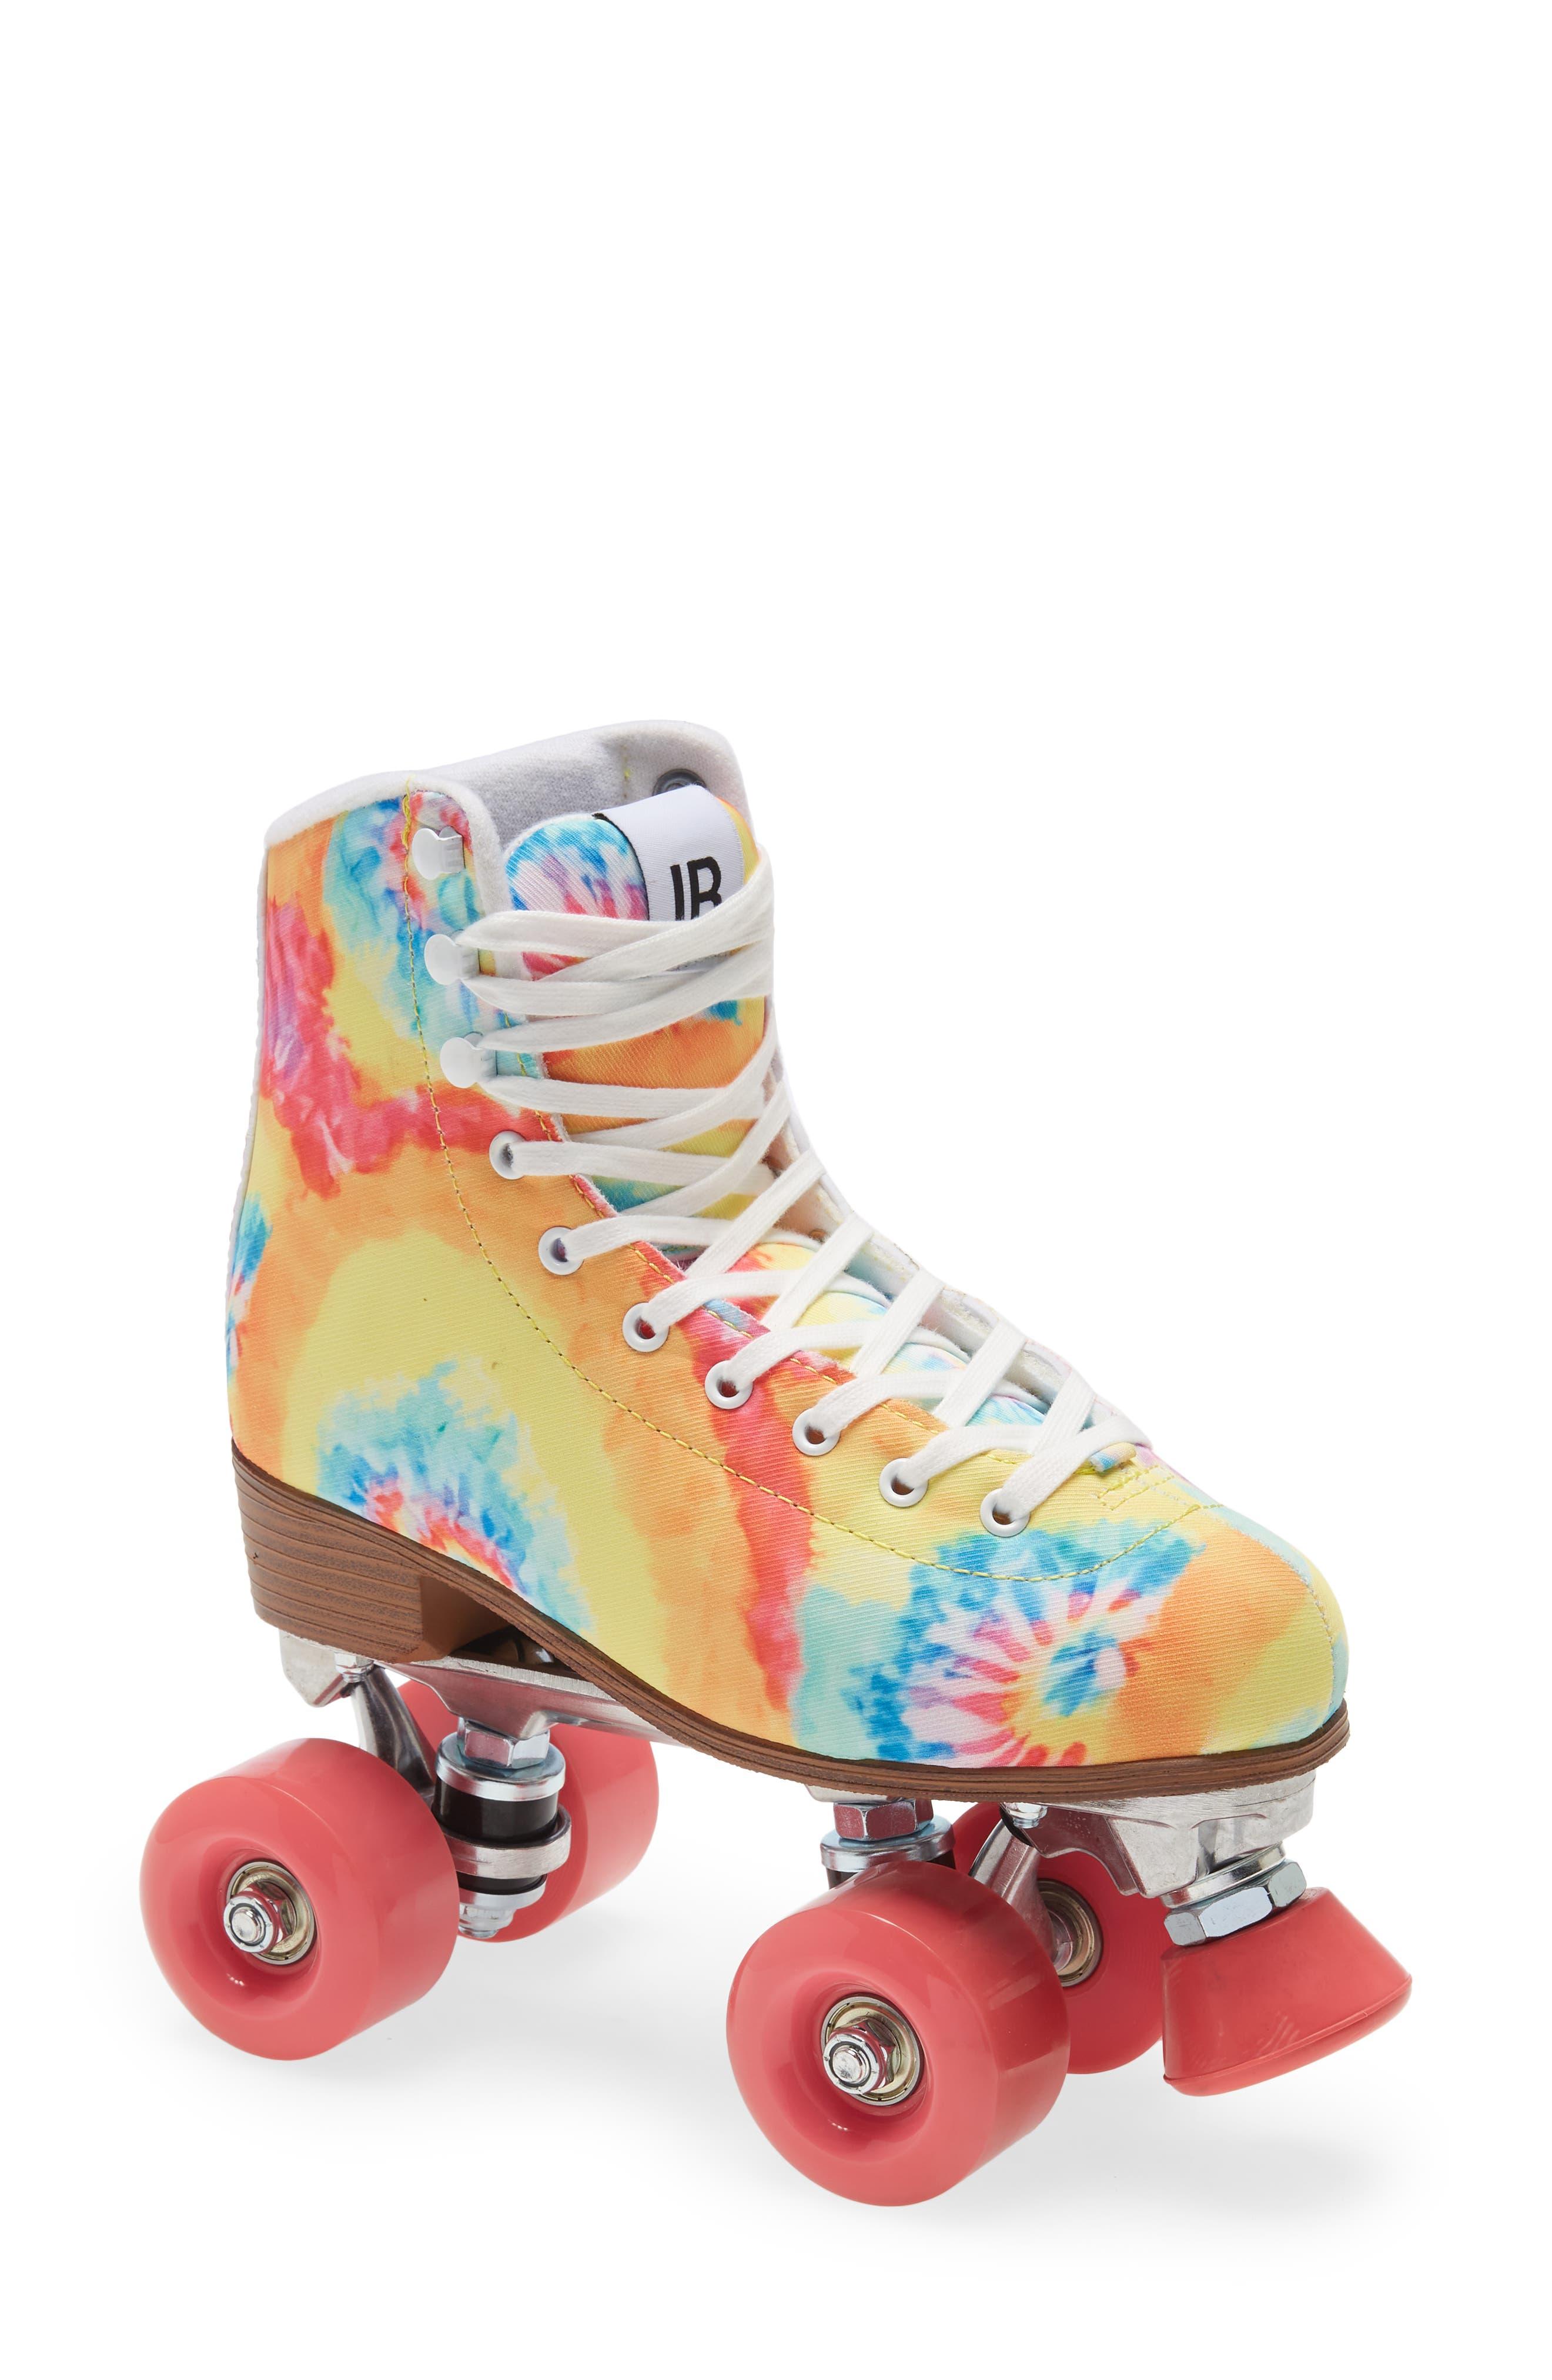 Trippy Roller Skates